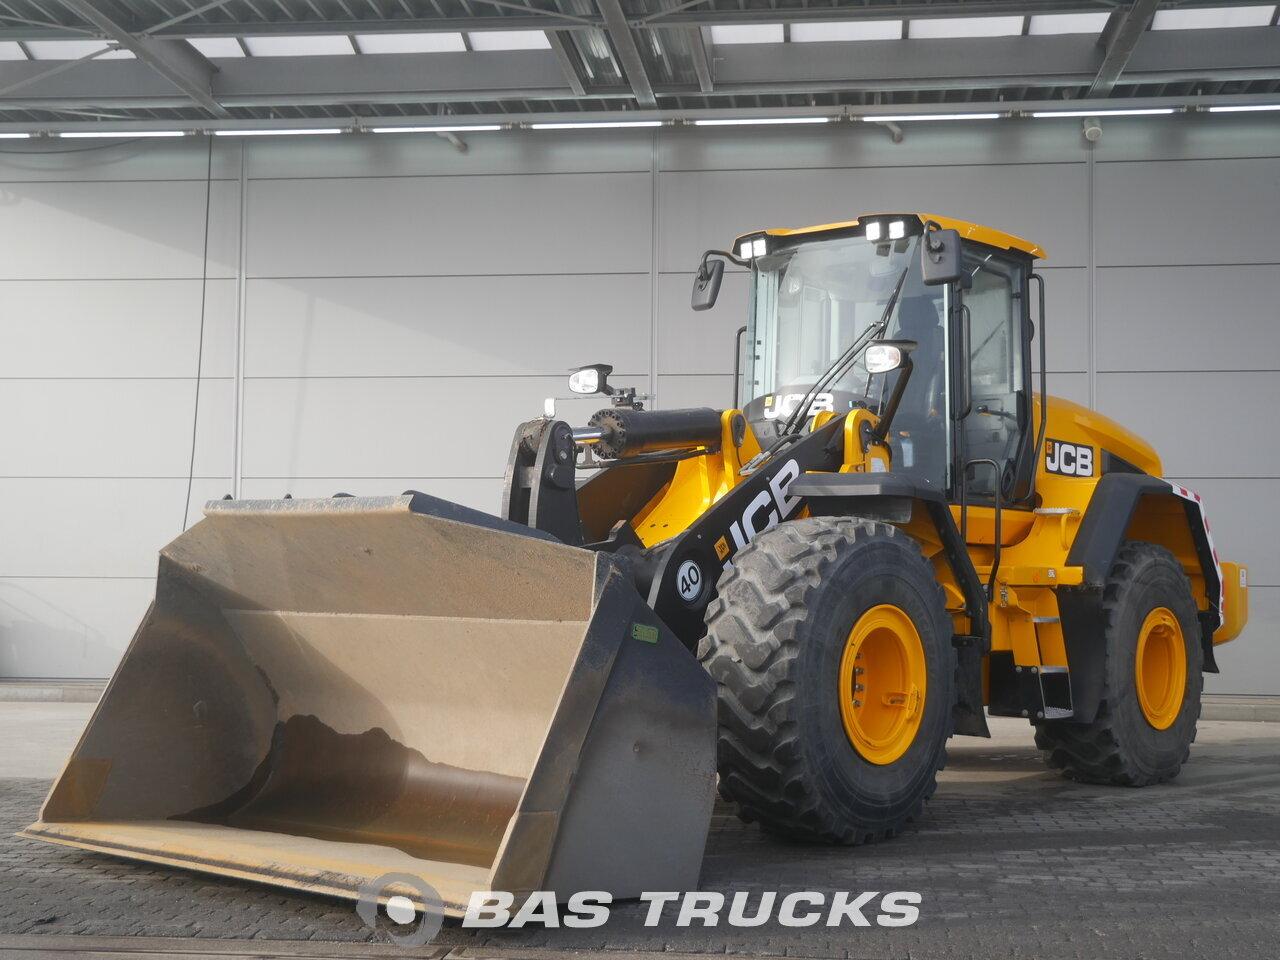 For sale at BAS Trucks: JCB 457 4X4 01/2016